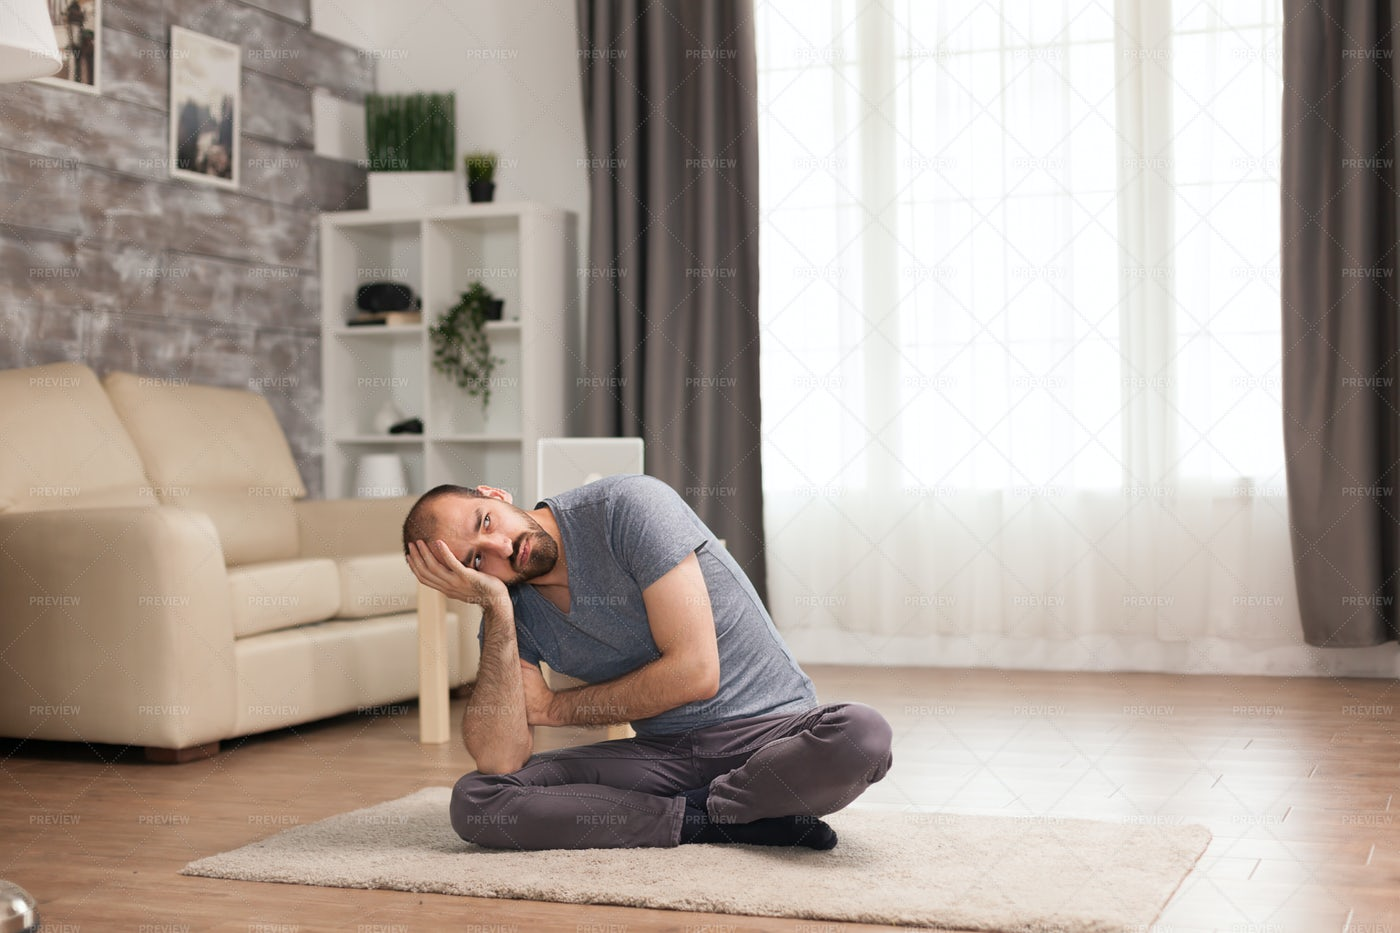 Alone On The Carpet: Stock Photos